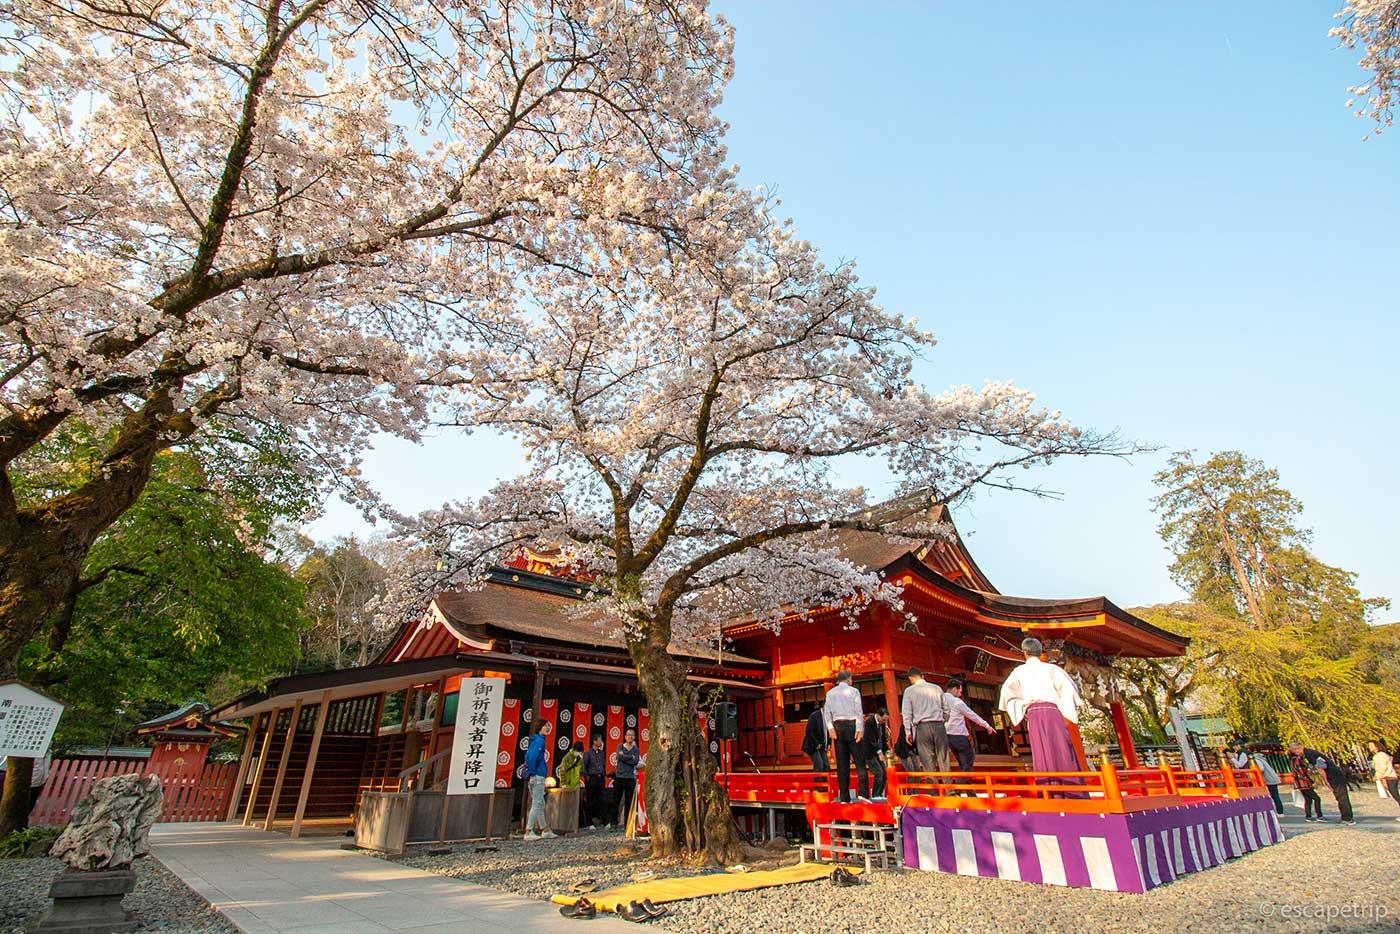 富士山本宮浅間大社の本殿と桜